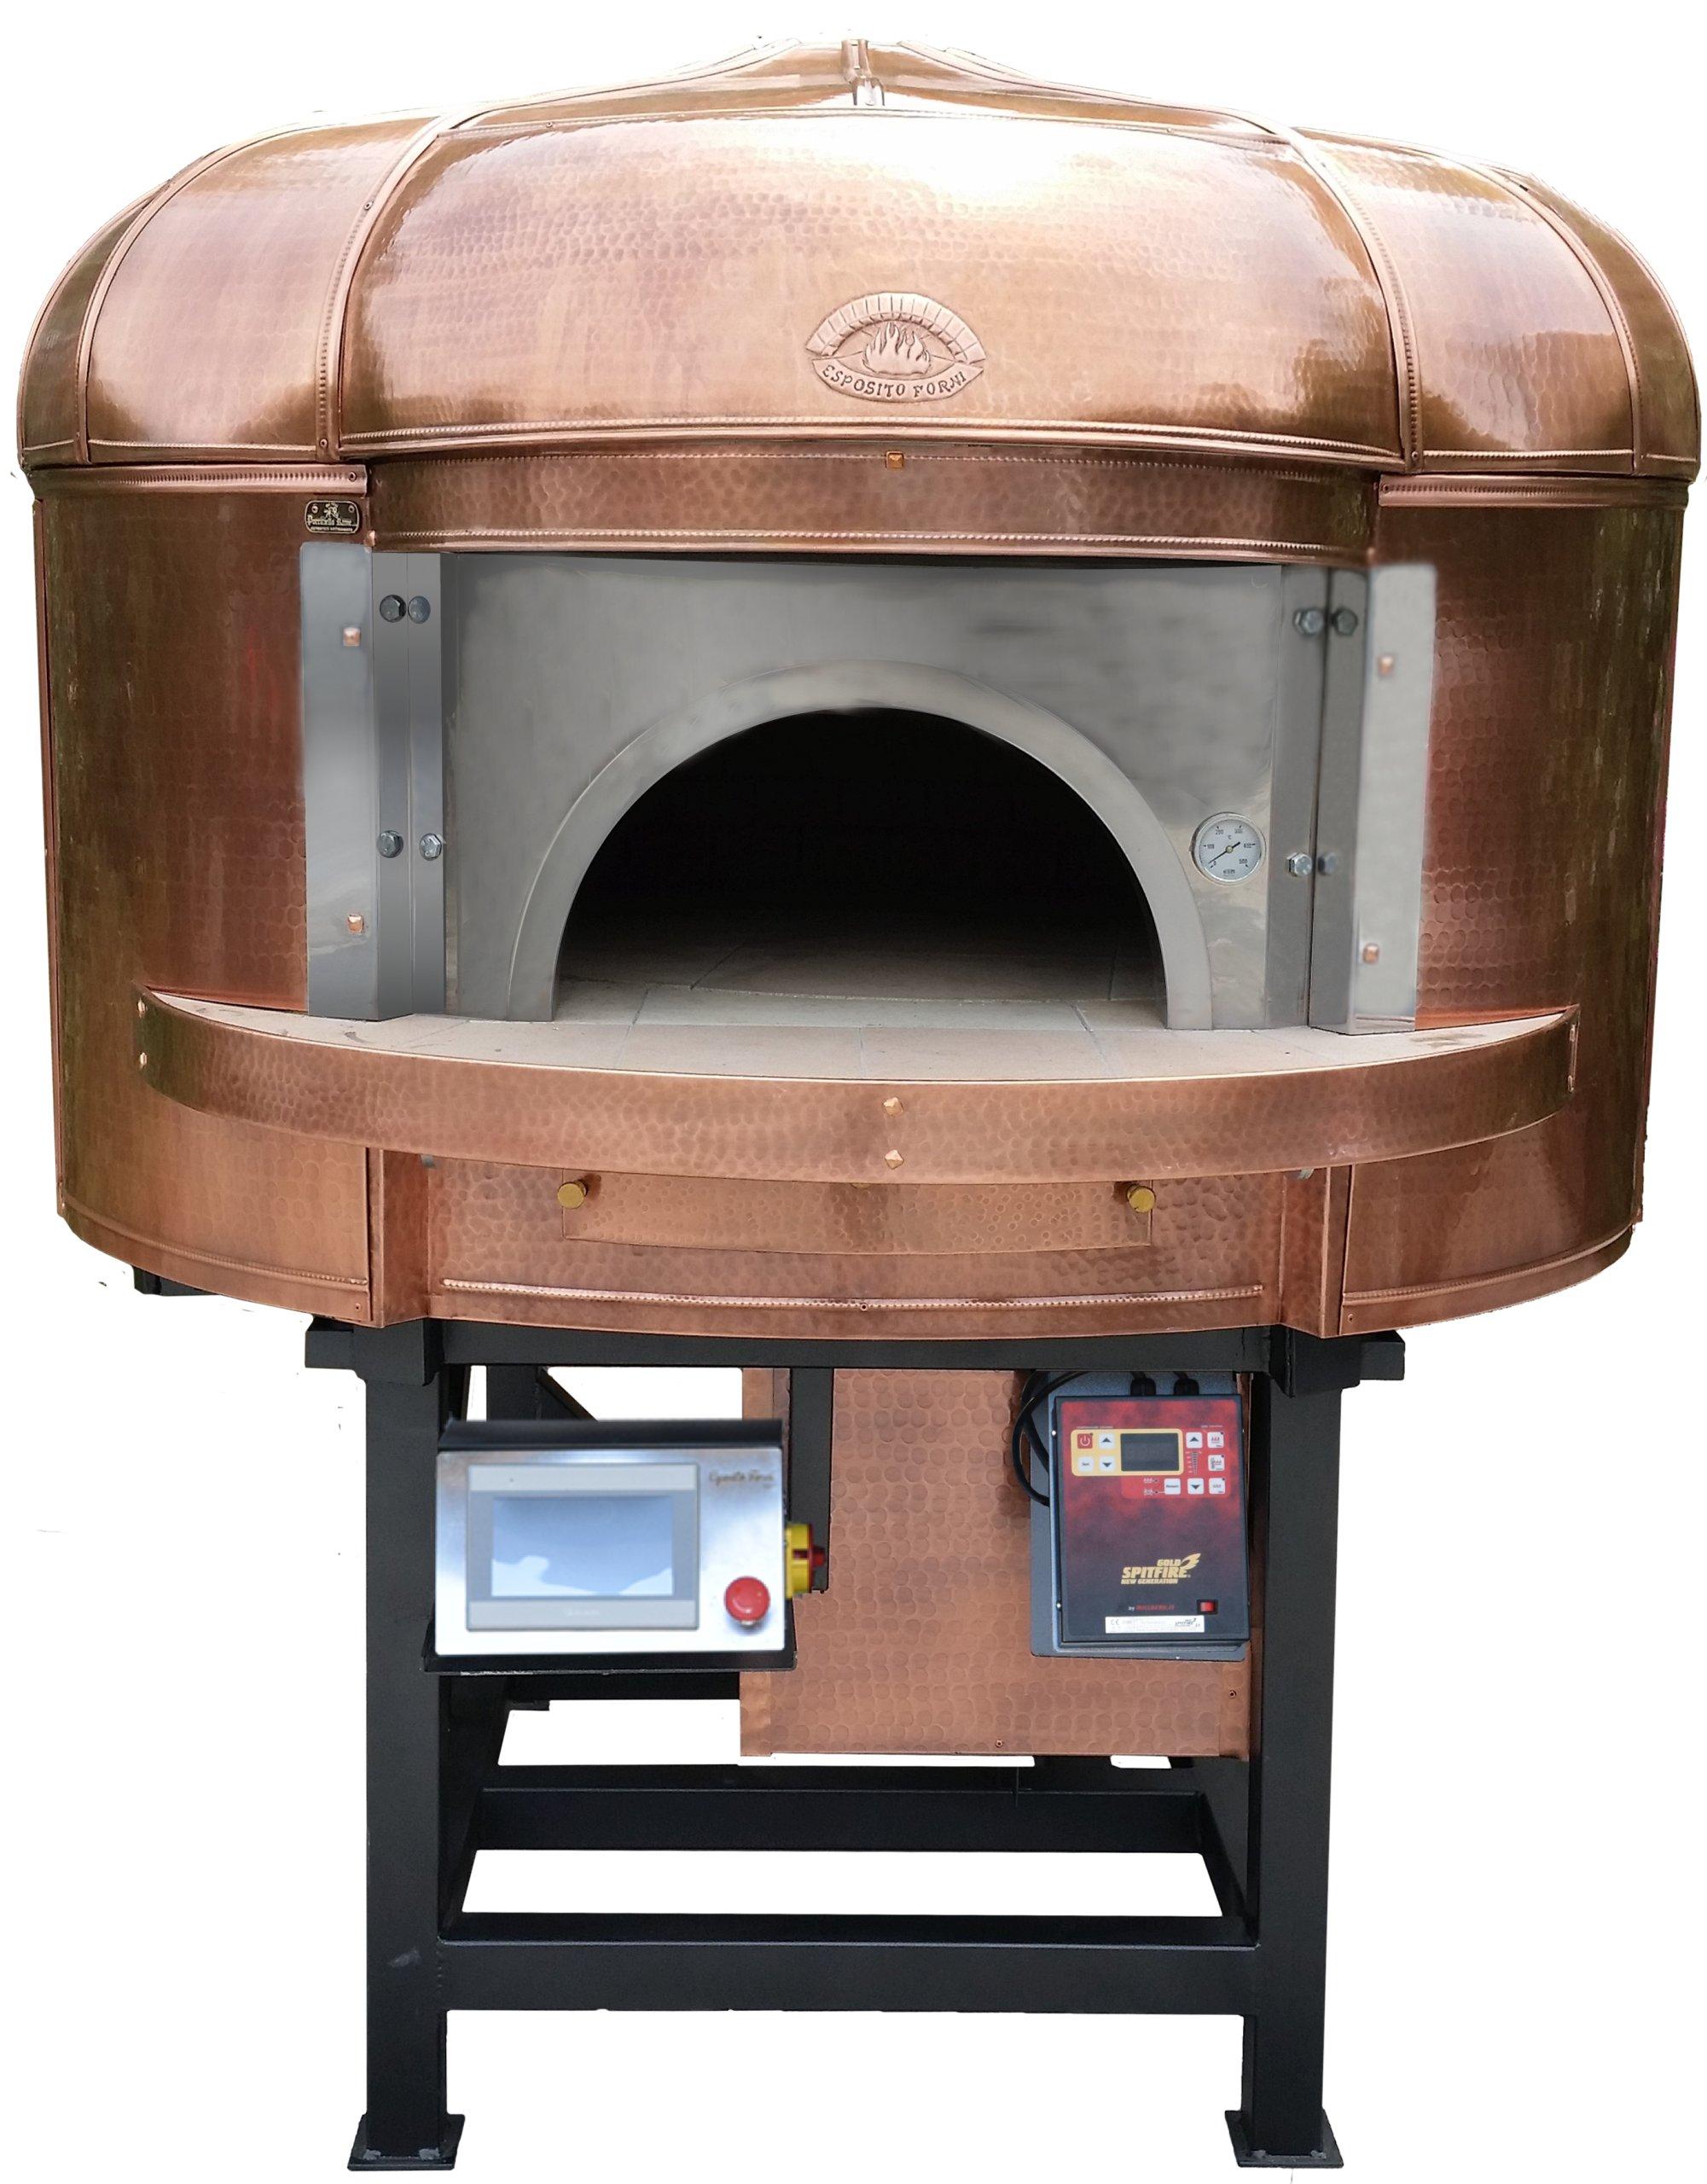 Super Piec do pizzy i chleba miedź 140 drewno/gaz - 7013681876 LB14